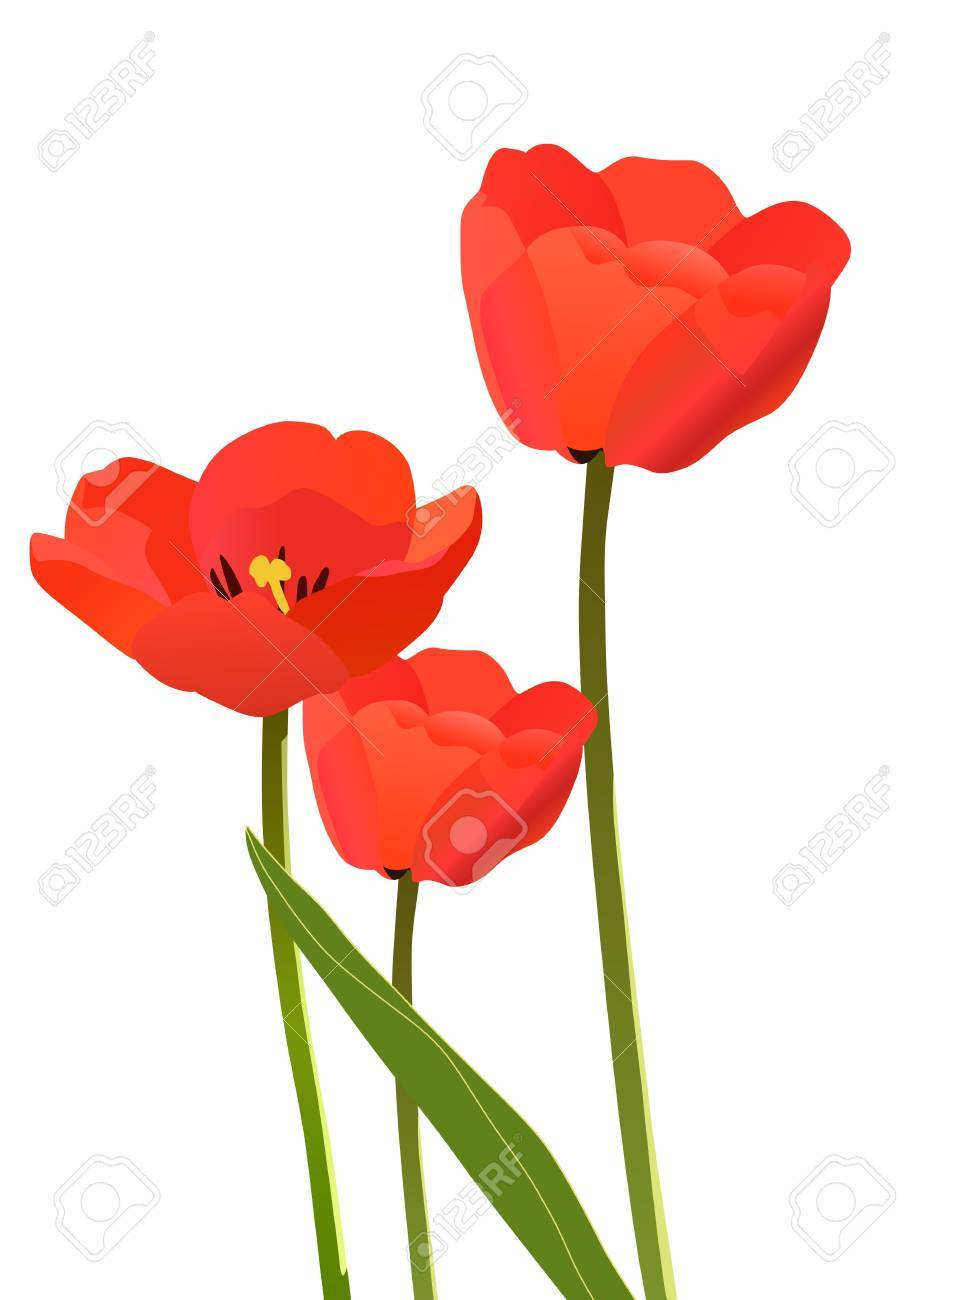 Three tulips isolated on white background - 12208303